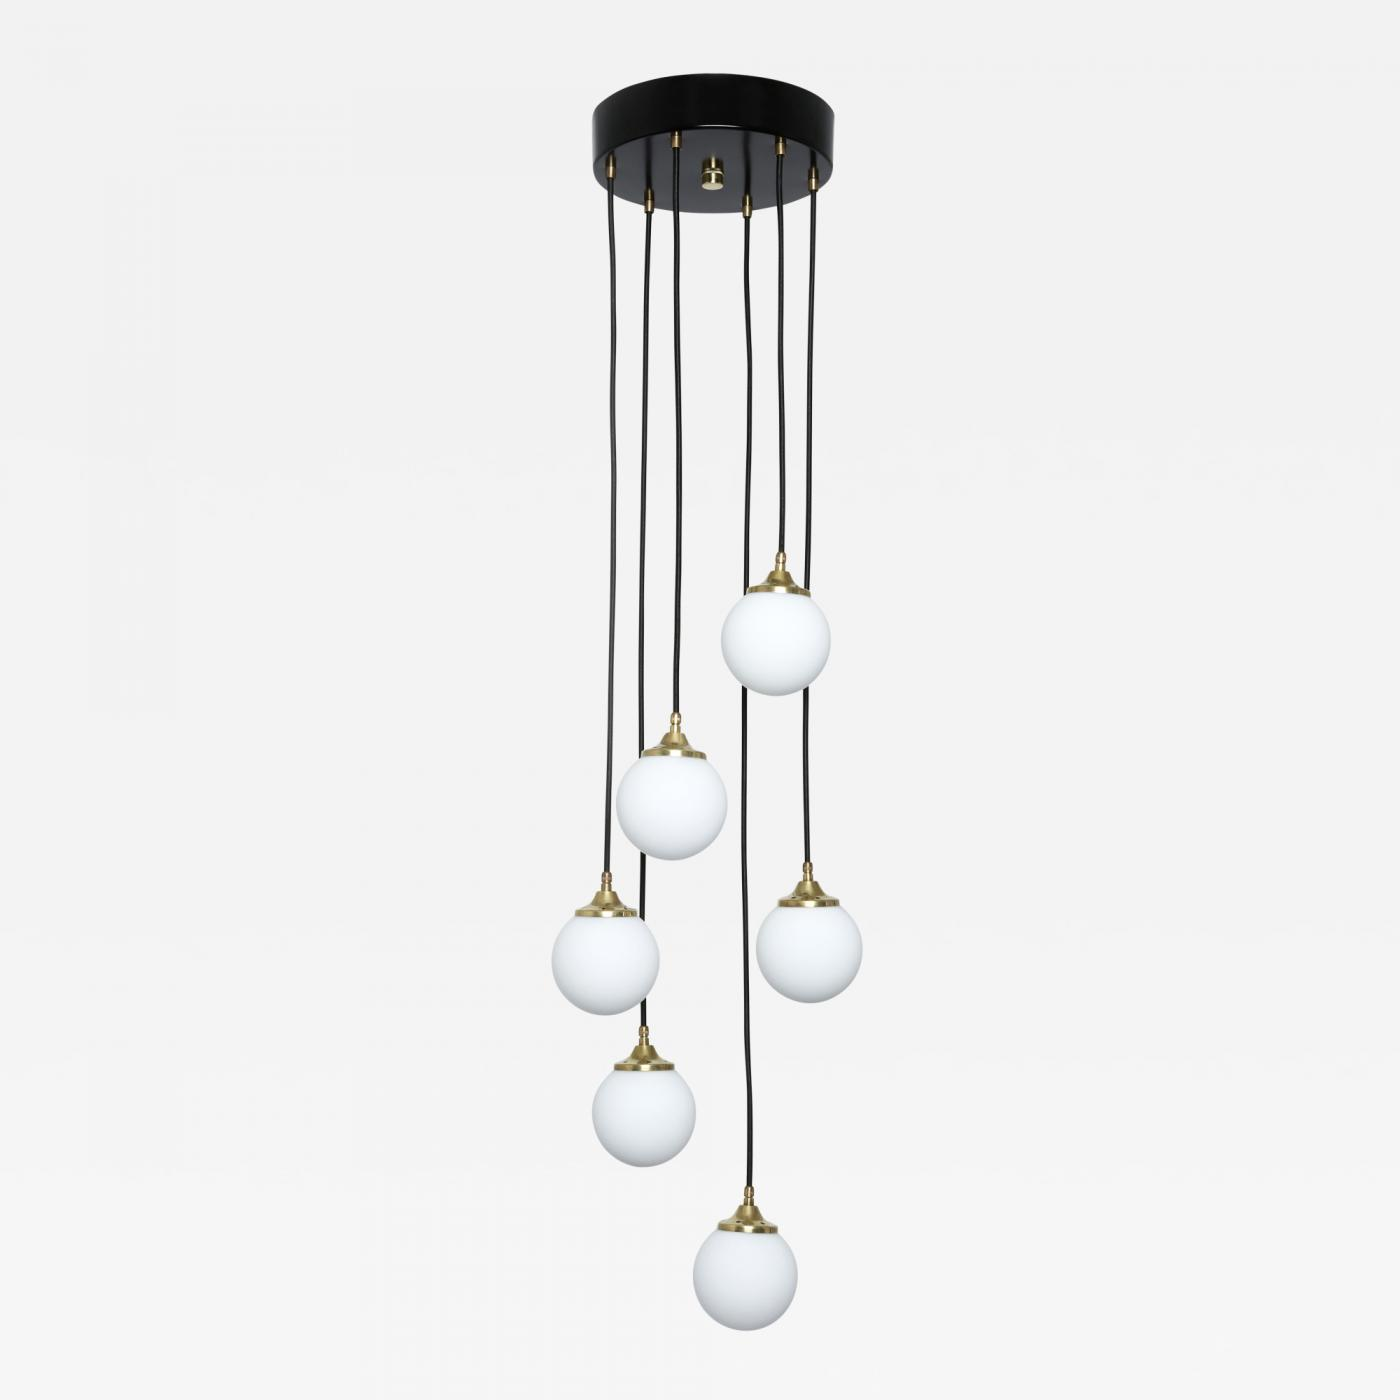 Stilnovo stilnovo attributed cascading chandelier listings furniture lighting chandeliers and pendants arubaitofo Gallery